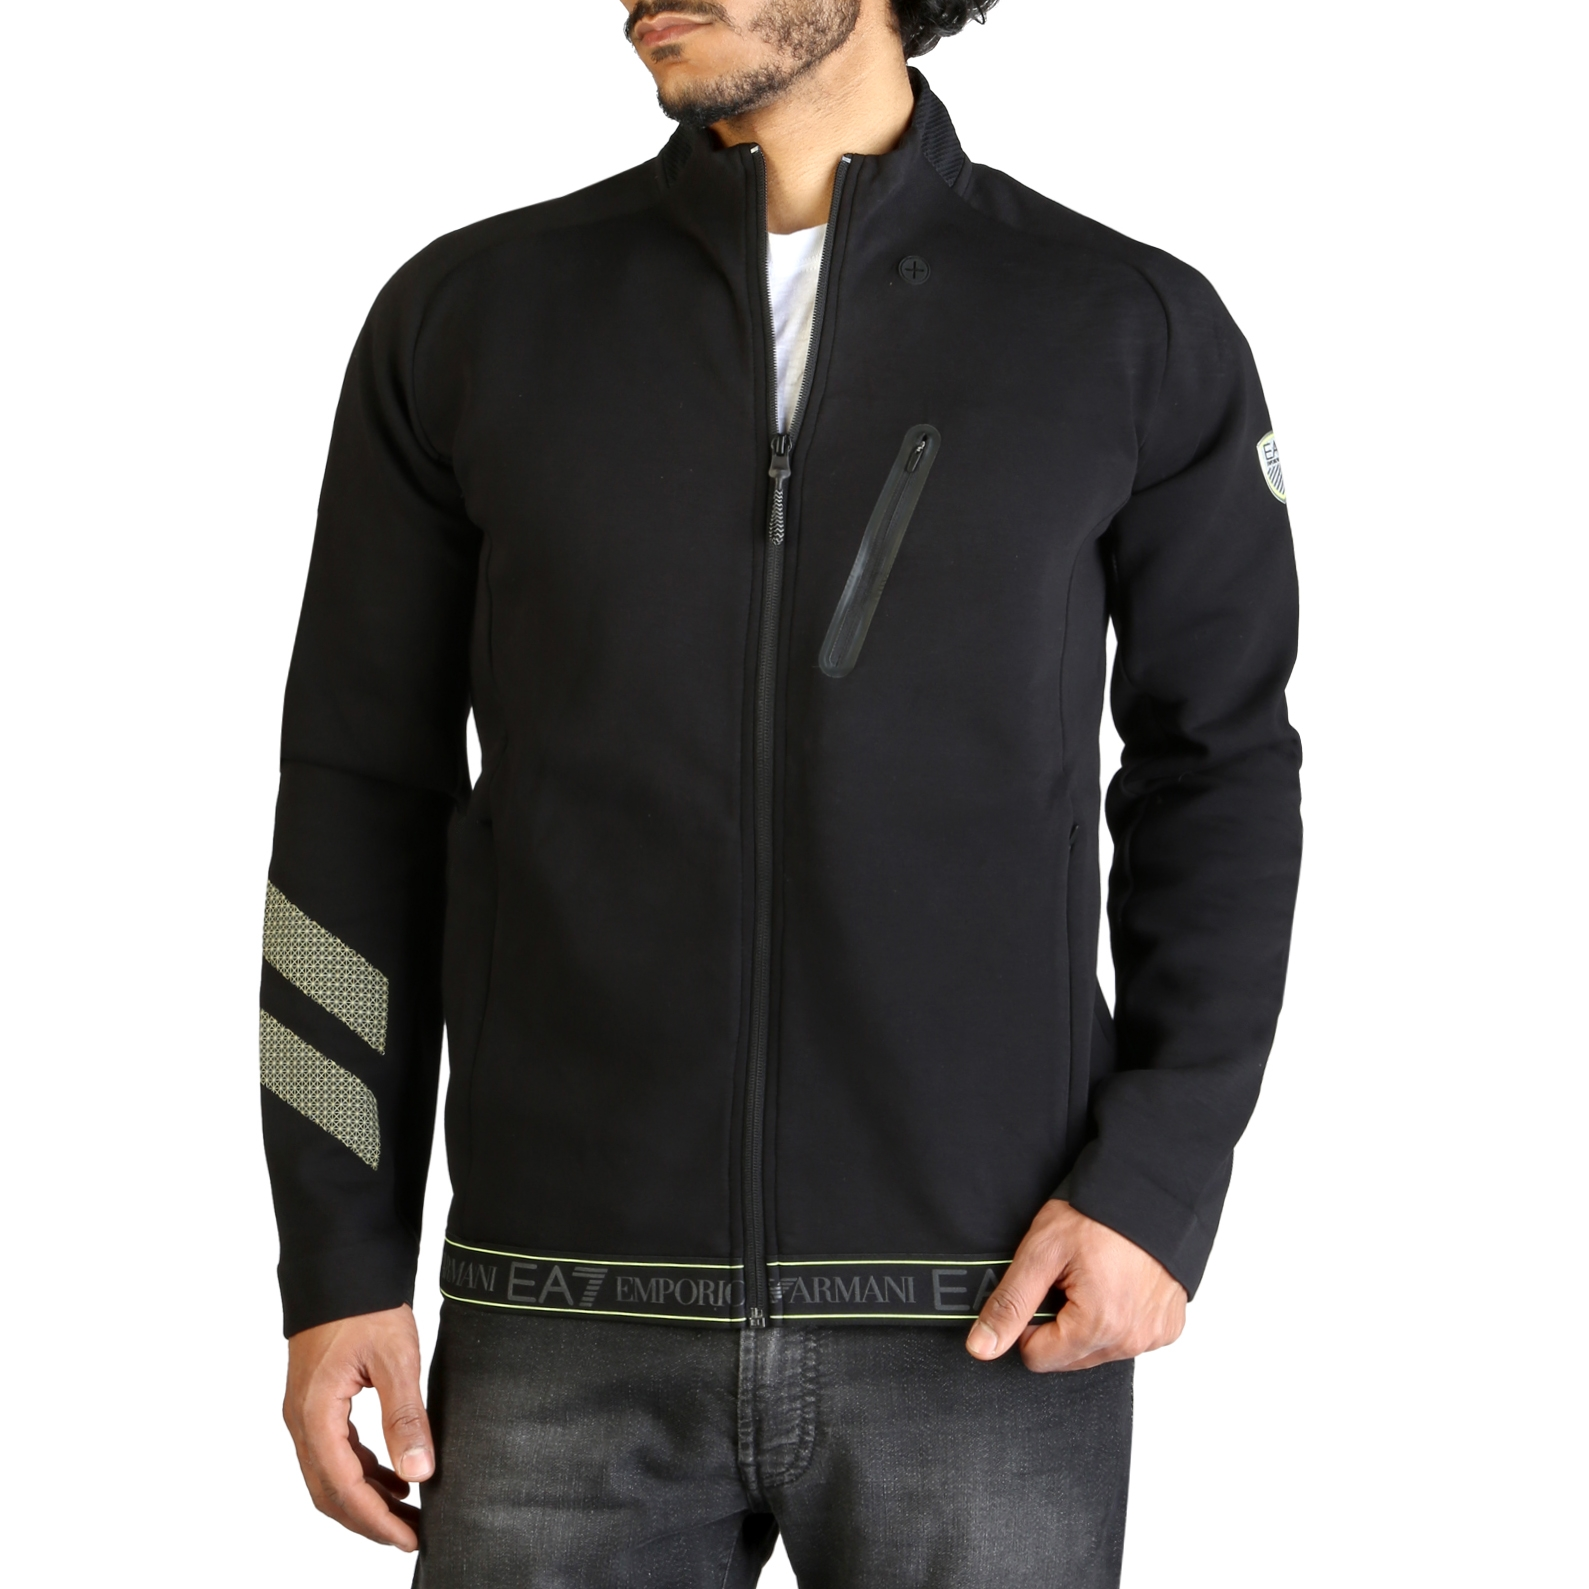 Bluze sport Ea7 3GPM19_PJT6Z Negru